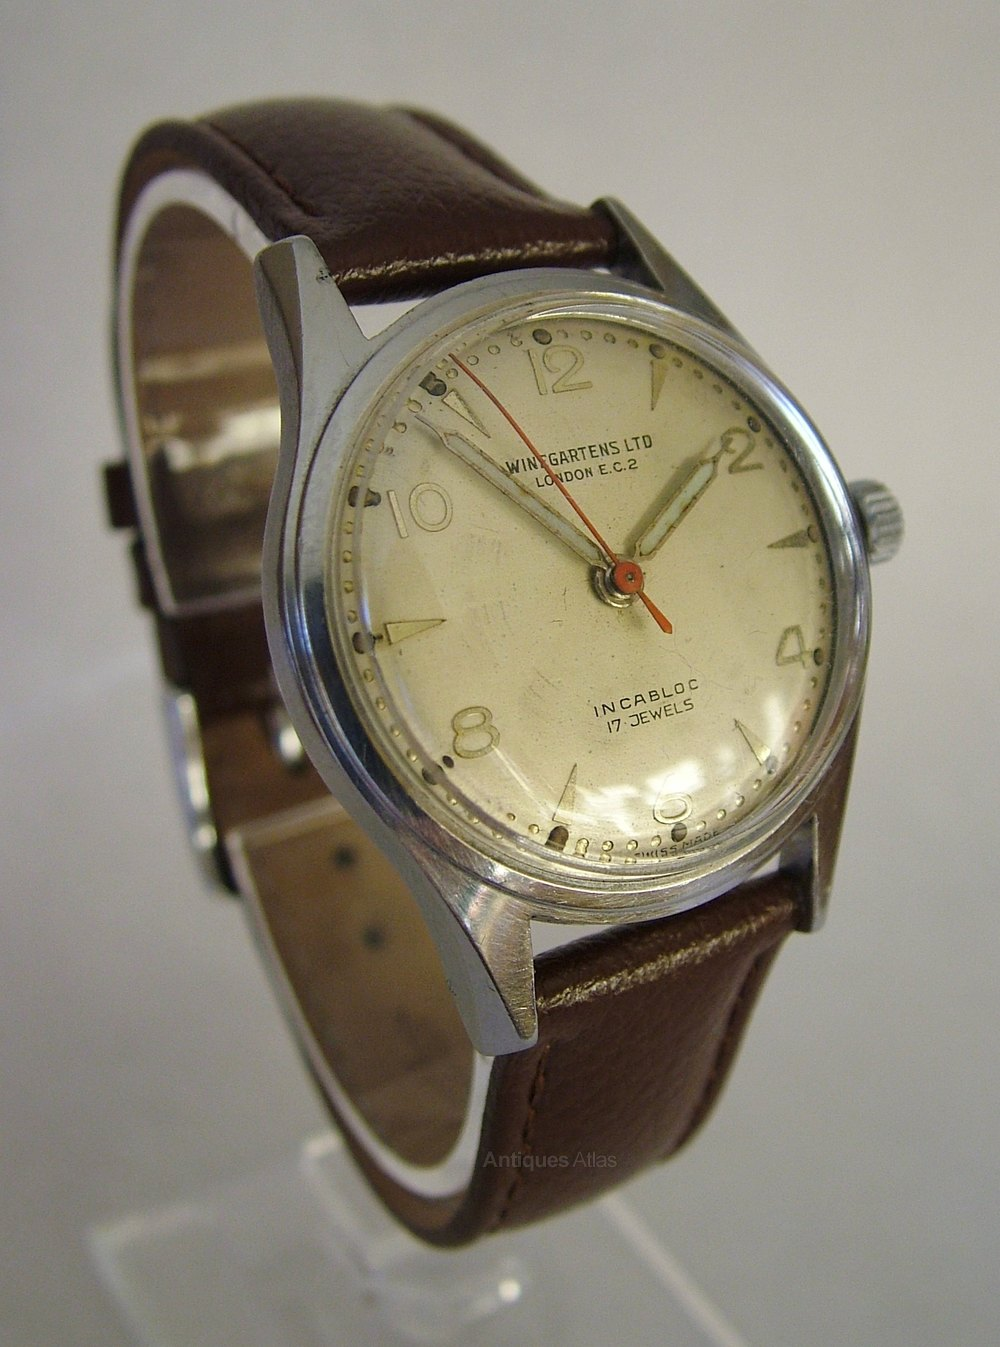 gents wrist watch - photo #24